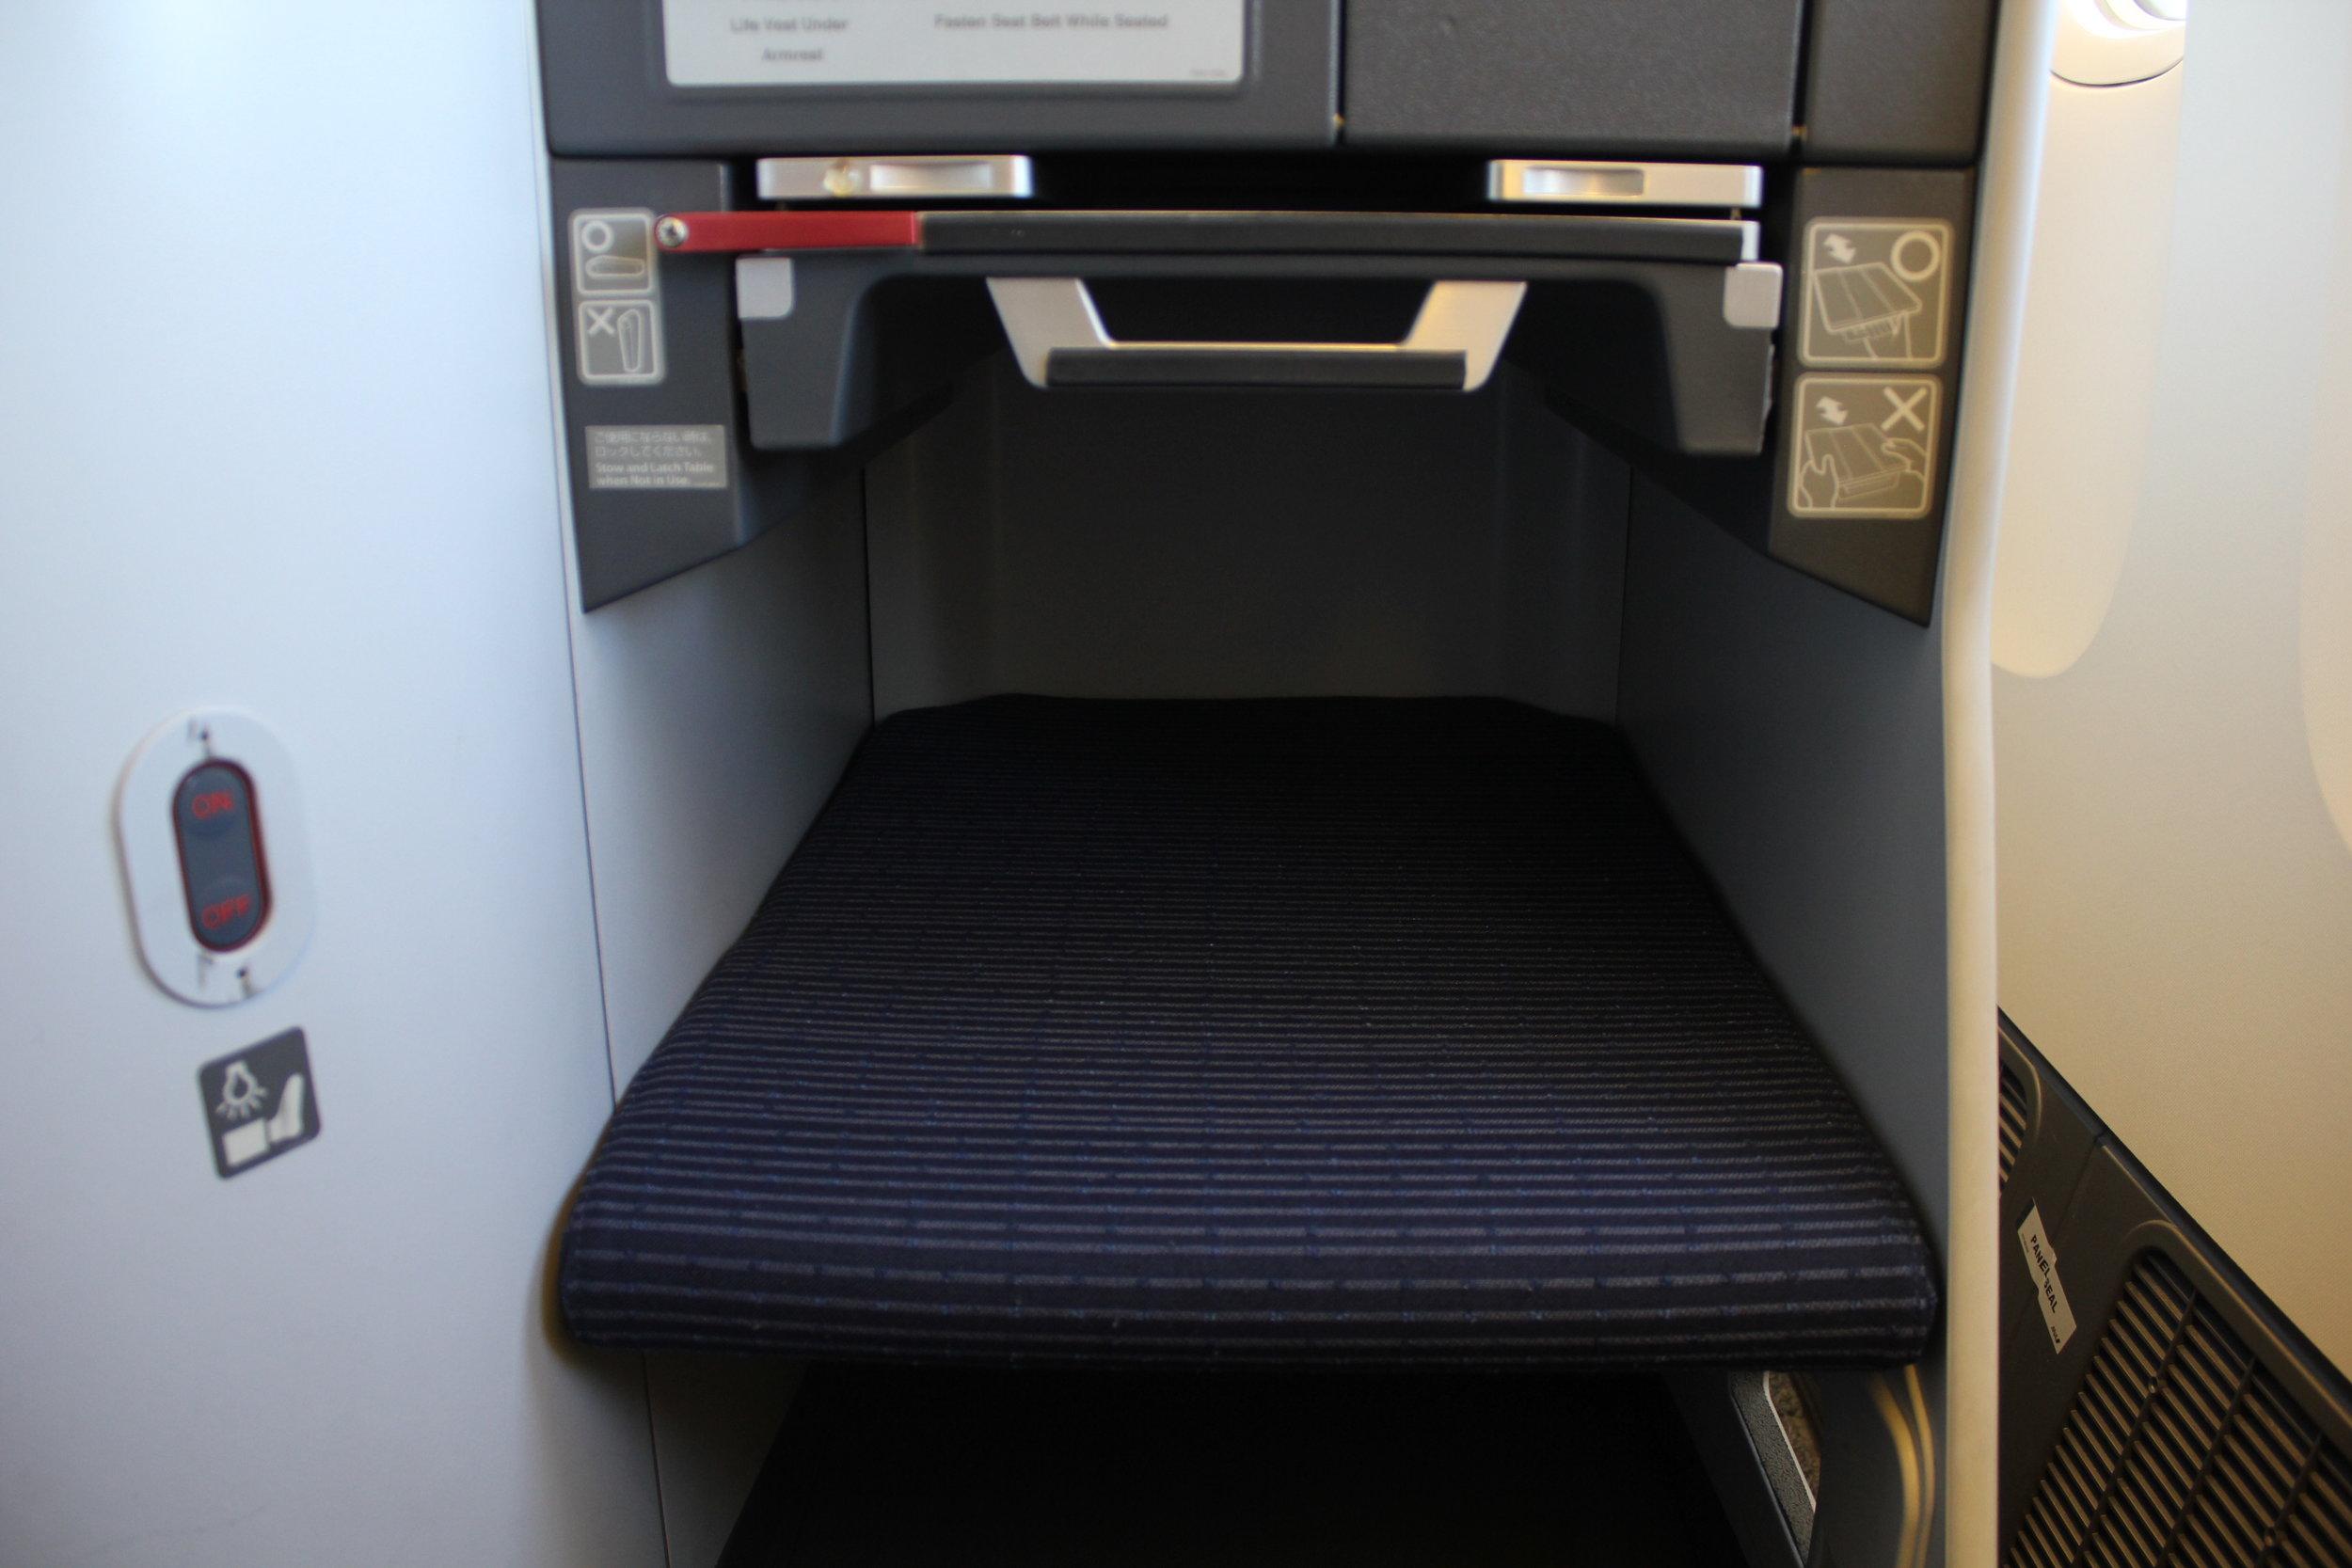 ANA 777 business class – Footrest